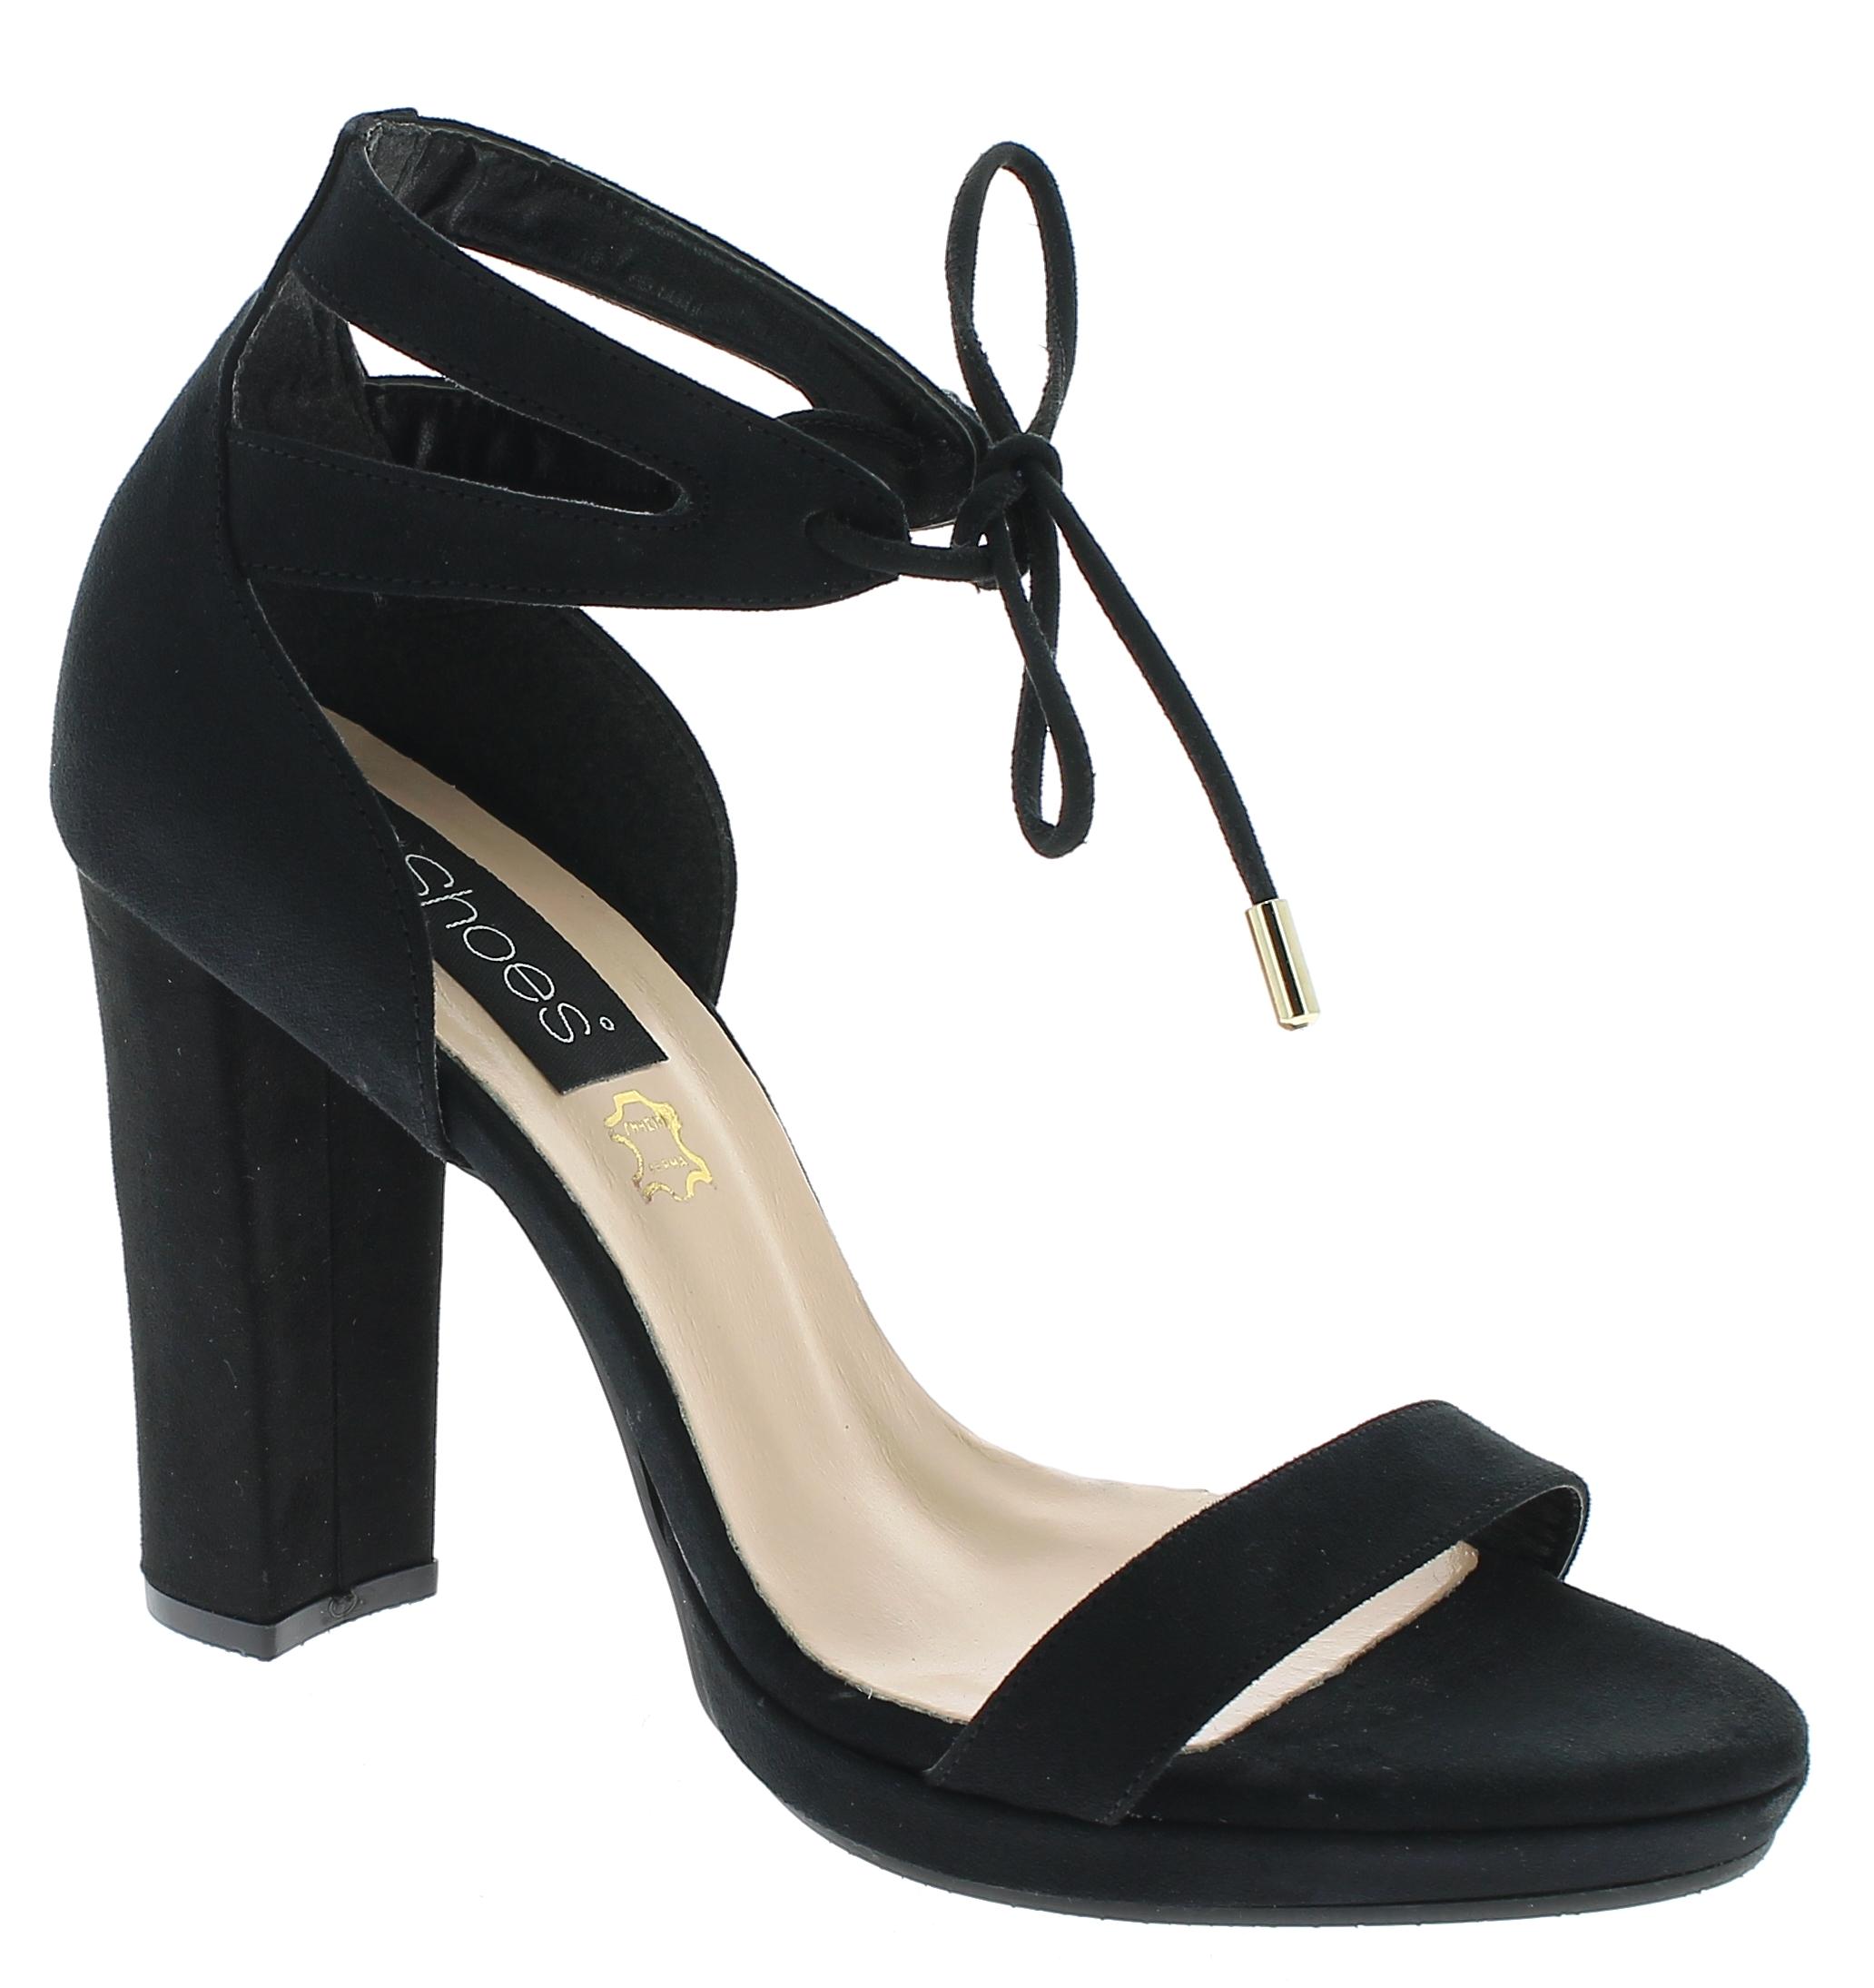 IQSHOES Γυναικείο Πέδιλο 1000 Μαύρο - IqShoes - 41.1000 BLACK -black-40/1/15/8 παπούτσια  πέδιλα